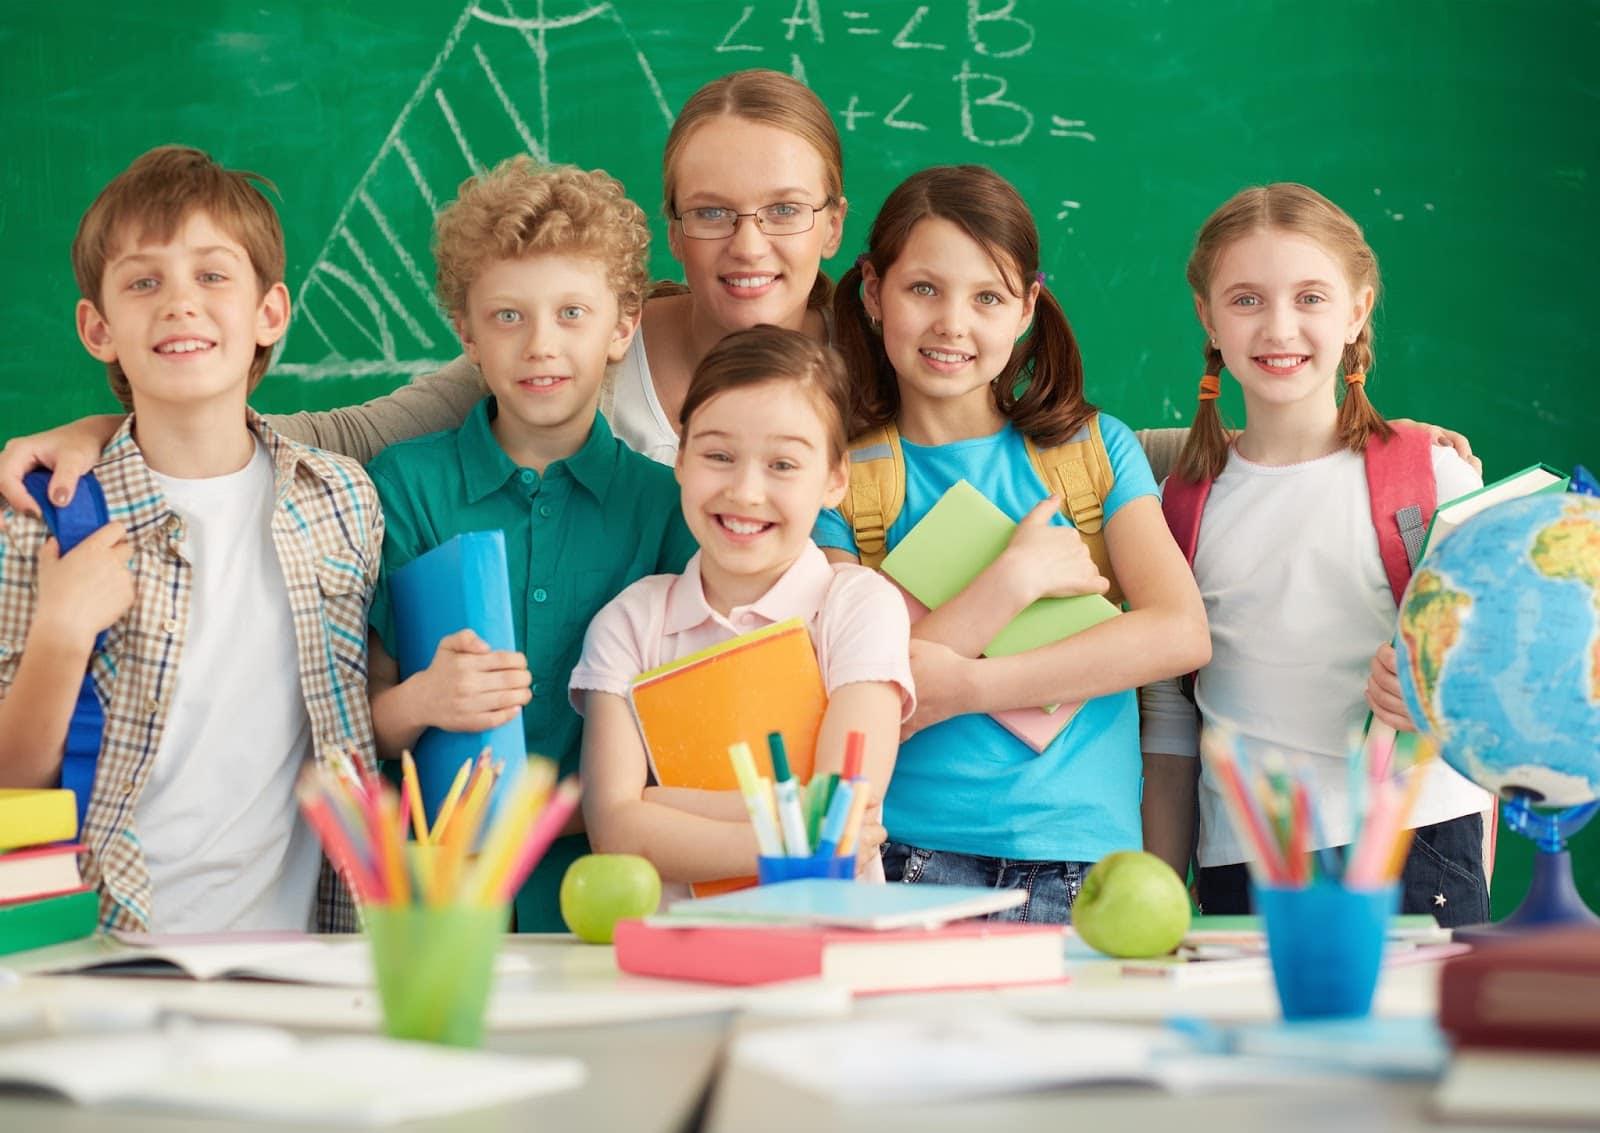 Картинка класс школьники